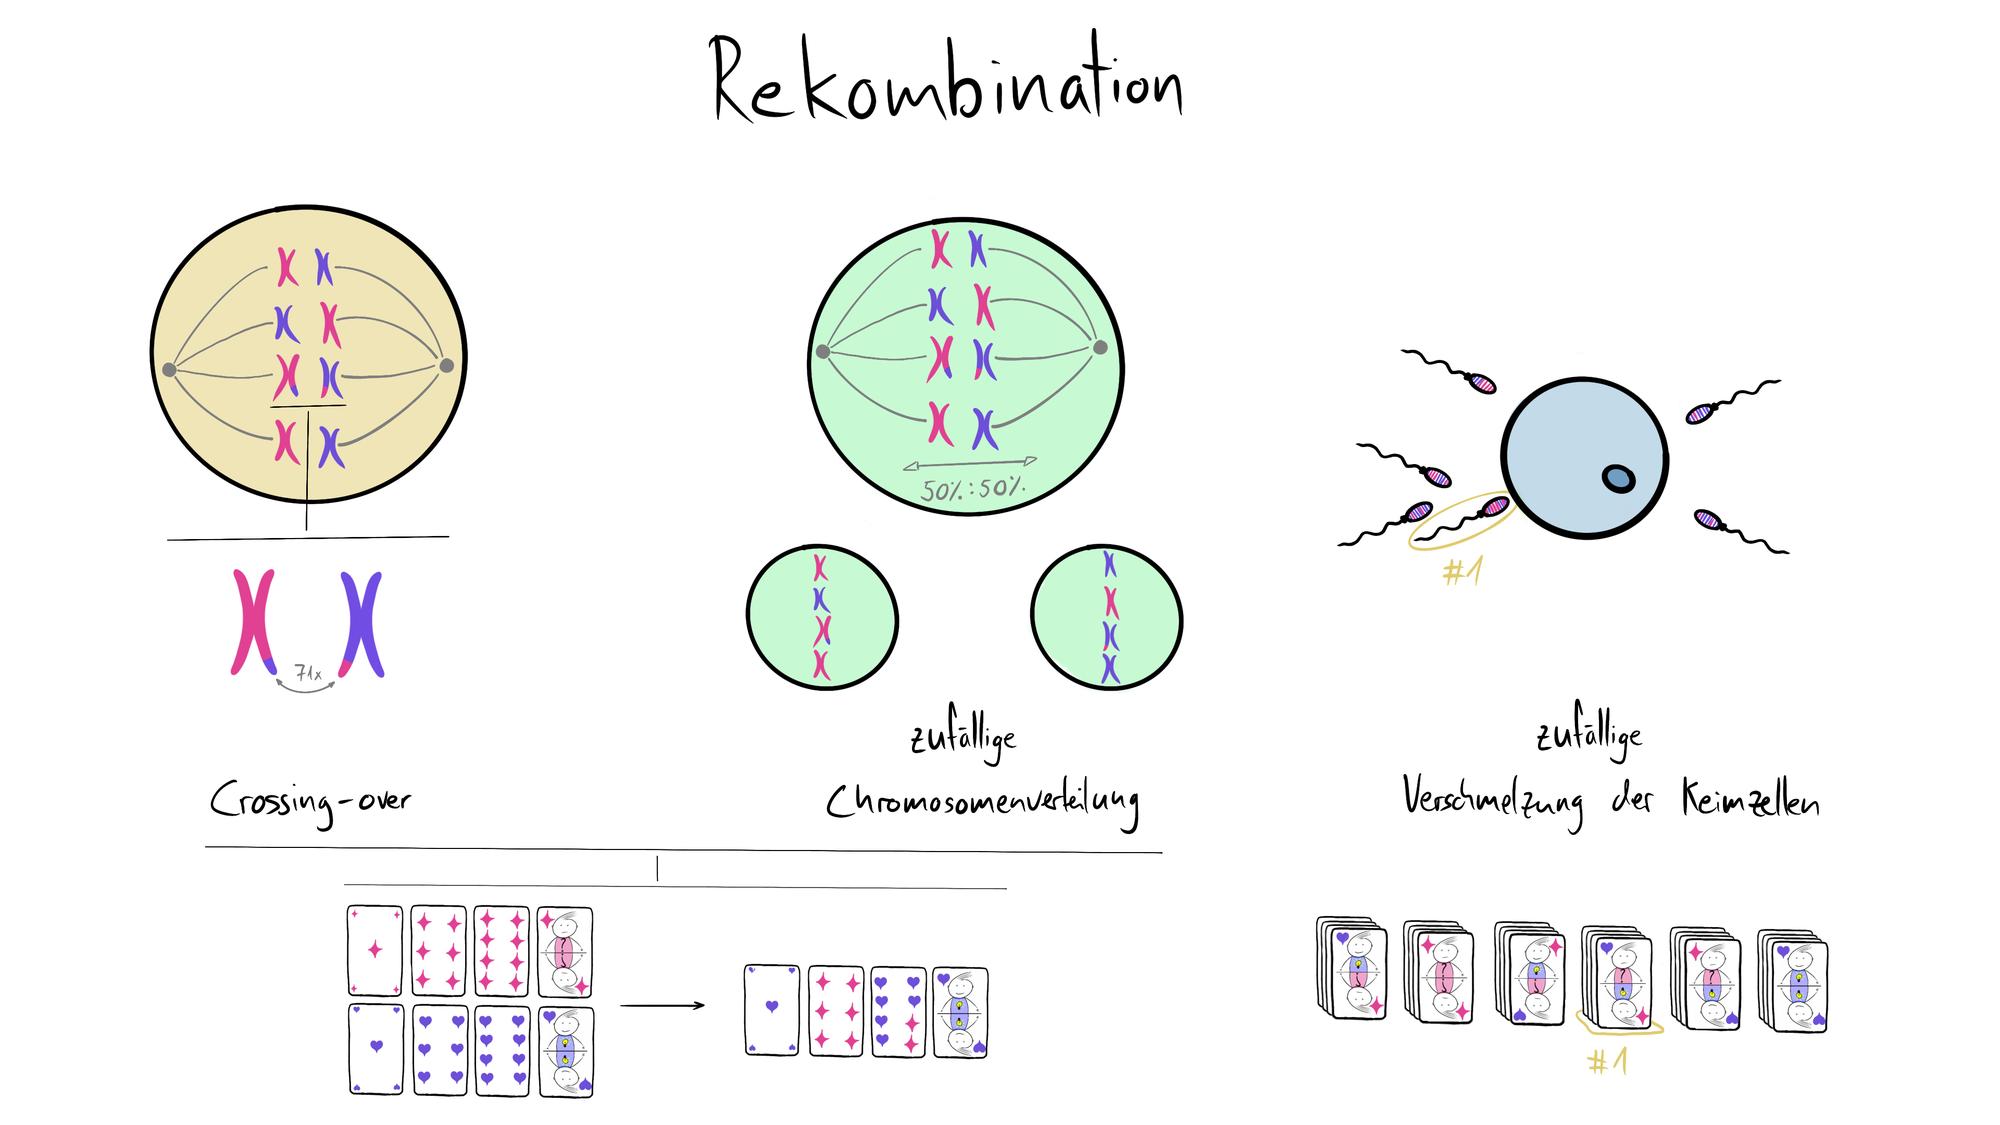 Rekombination